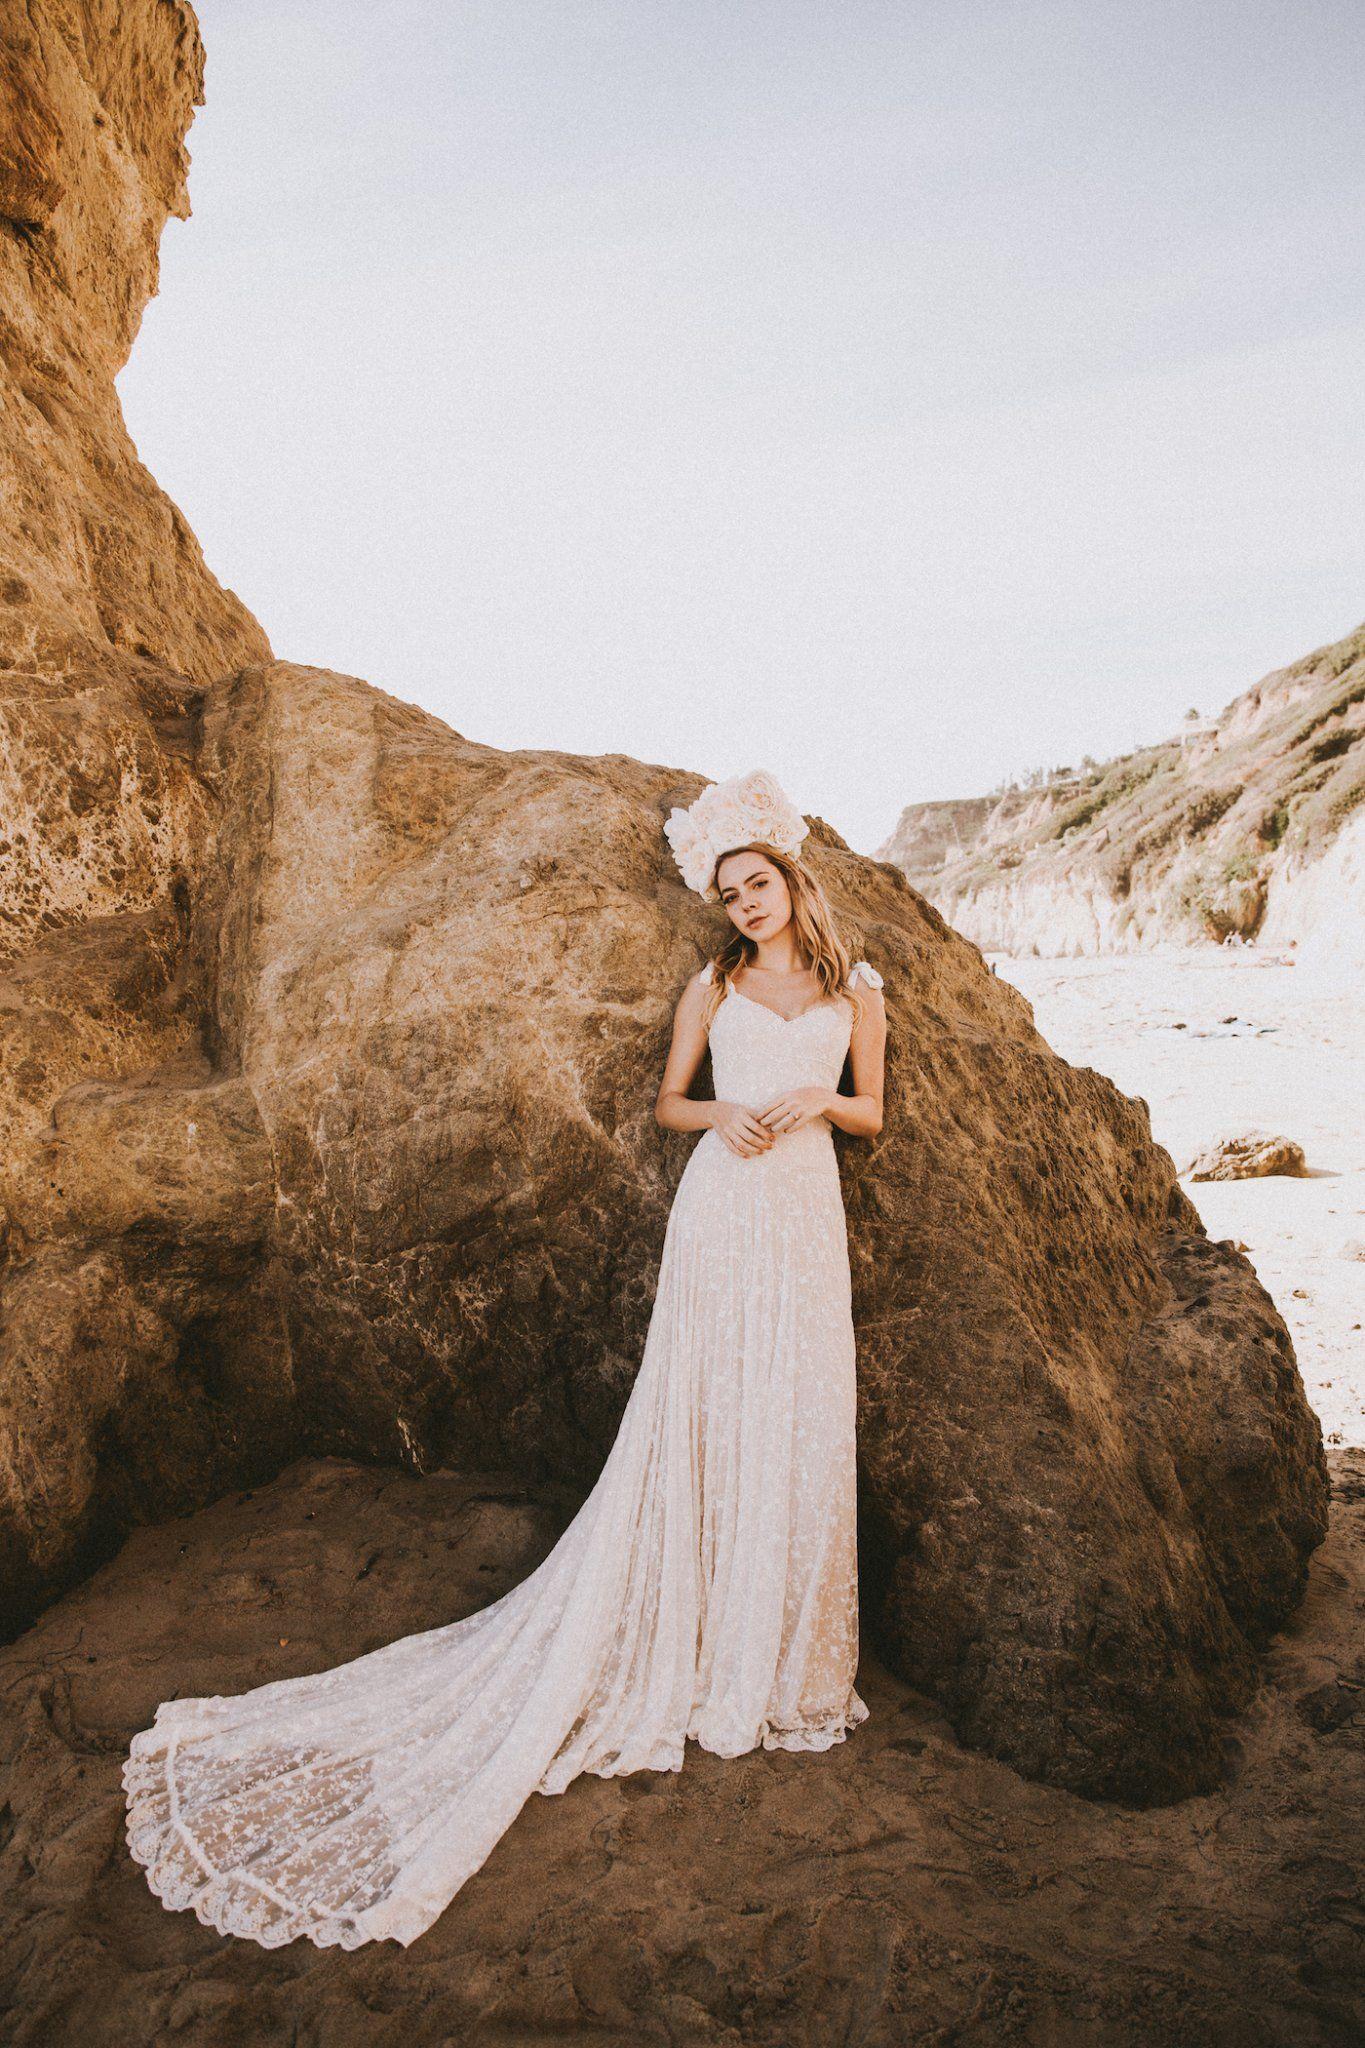 Lace wedding dress low back  Evangeline Lace Wedding Dress  wedding dress  Pinterest  Simple